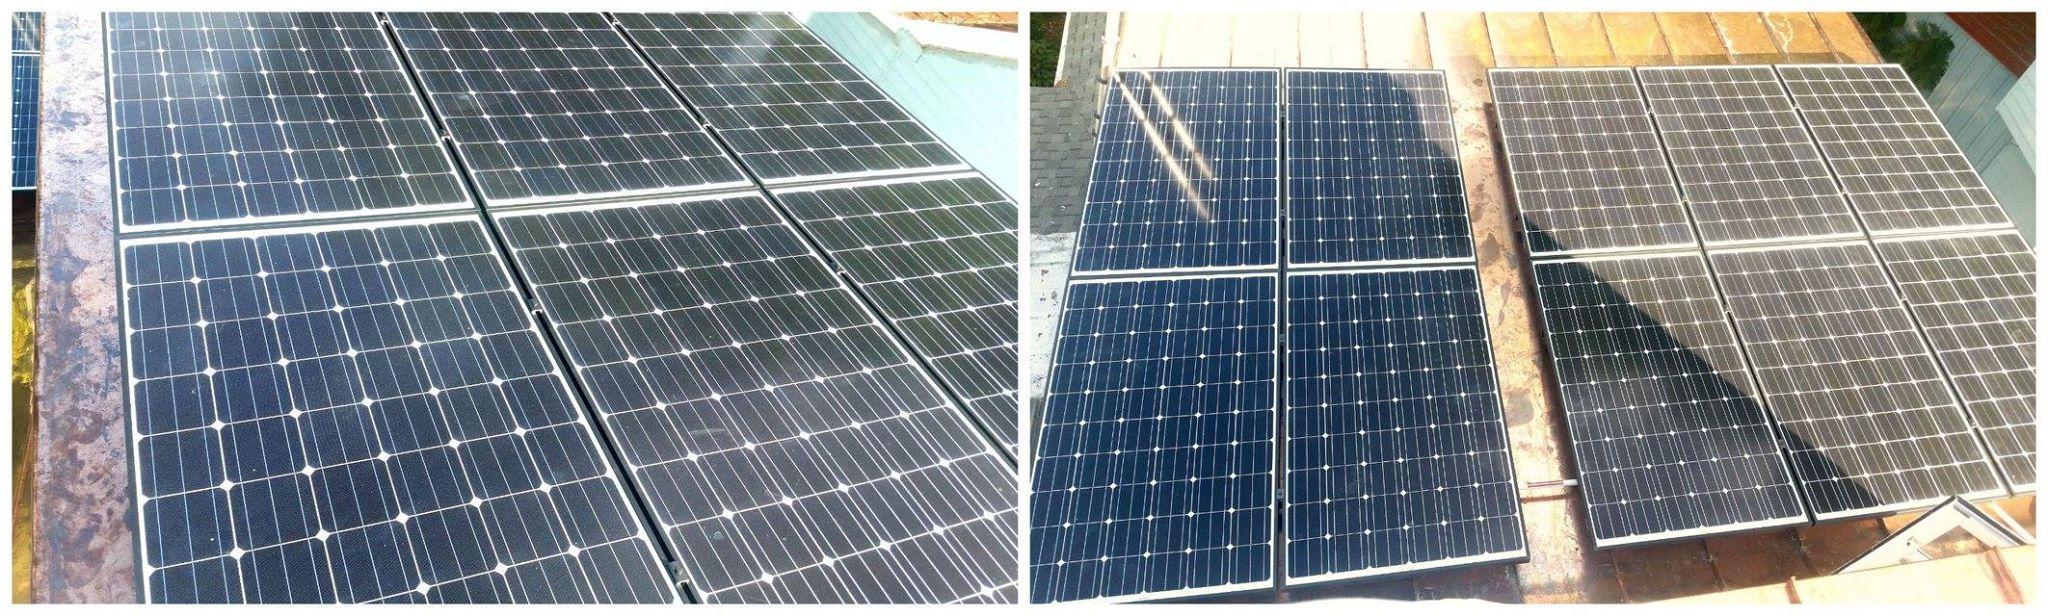 Solar Panel Installation Annapolis Md Maryland Solar